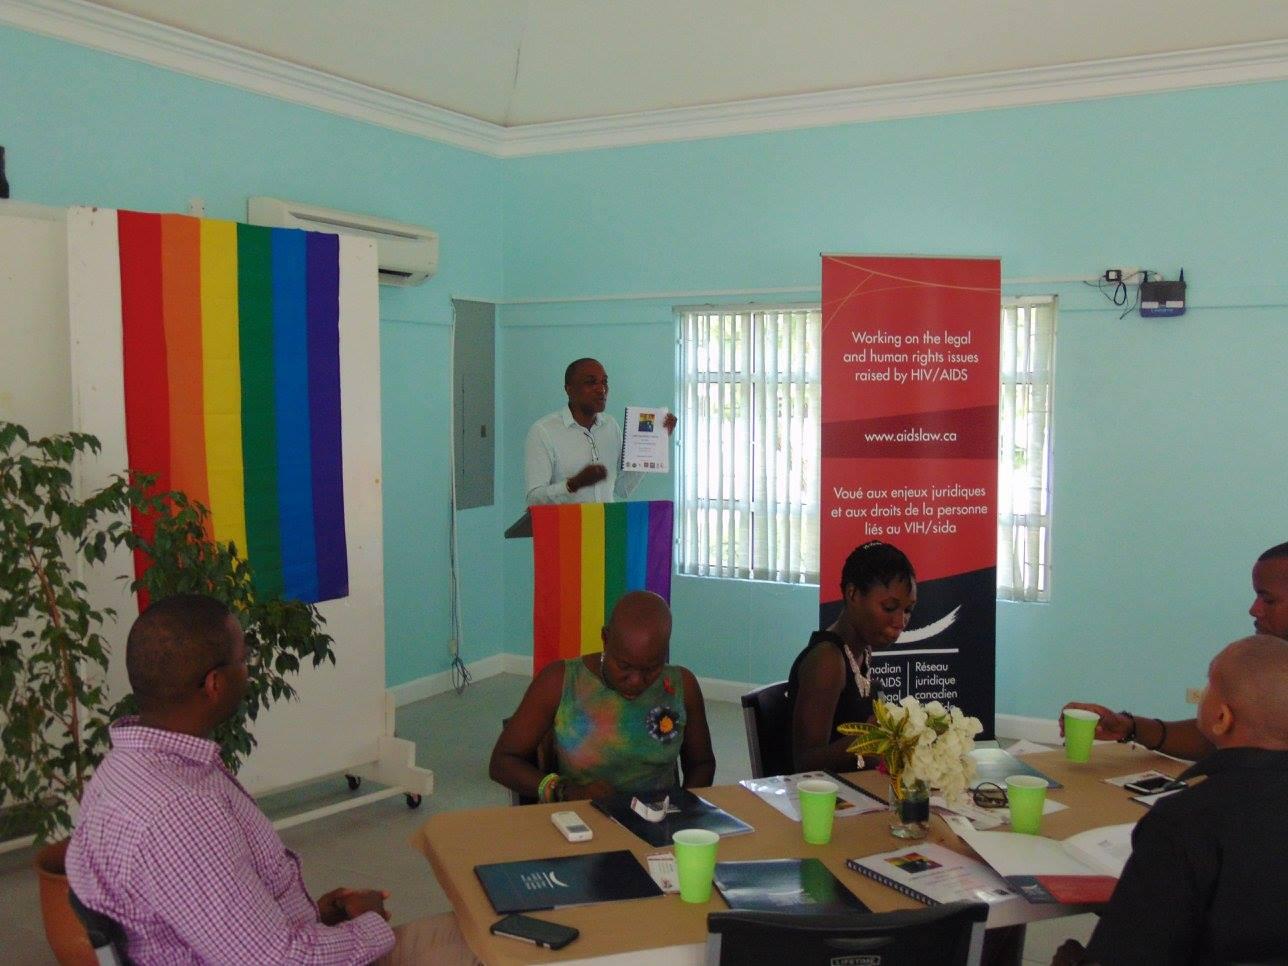 Barbados Sunday Brunch